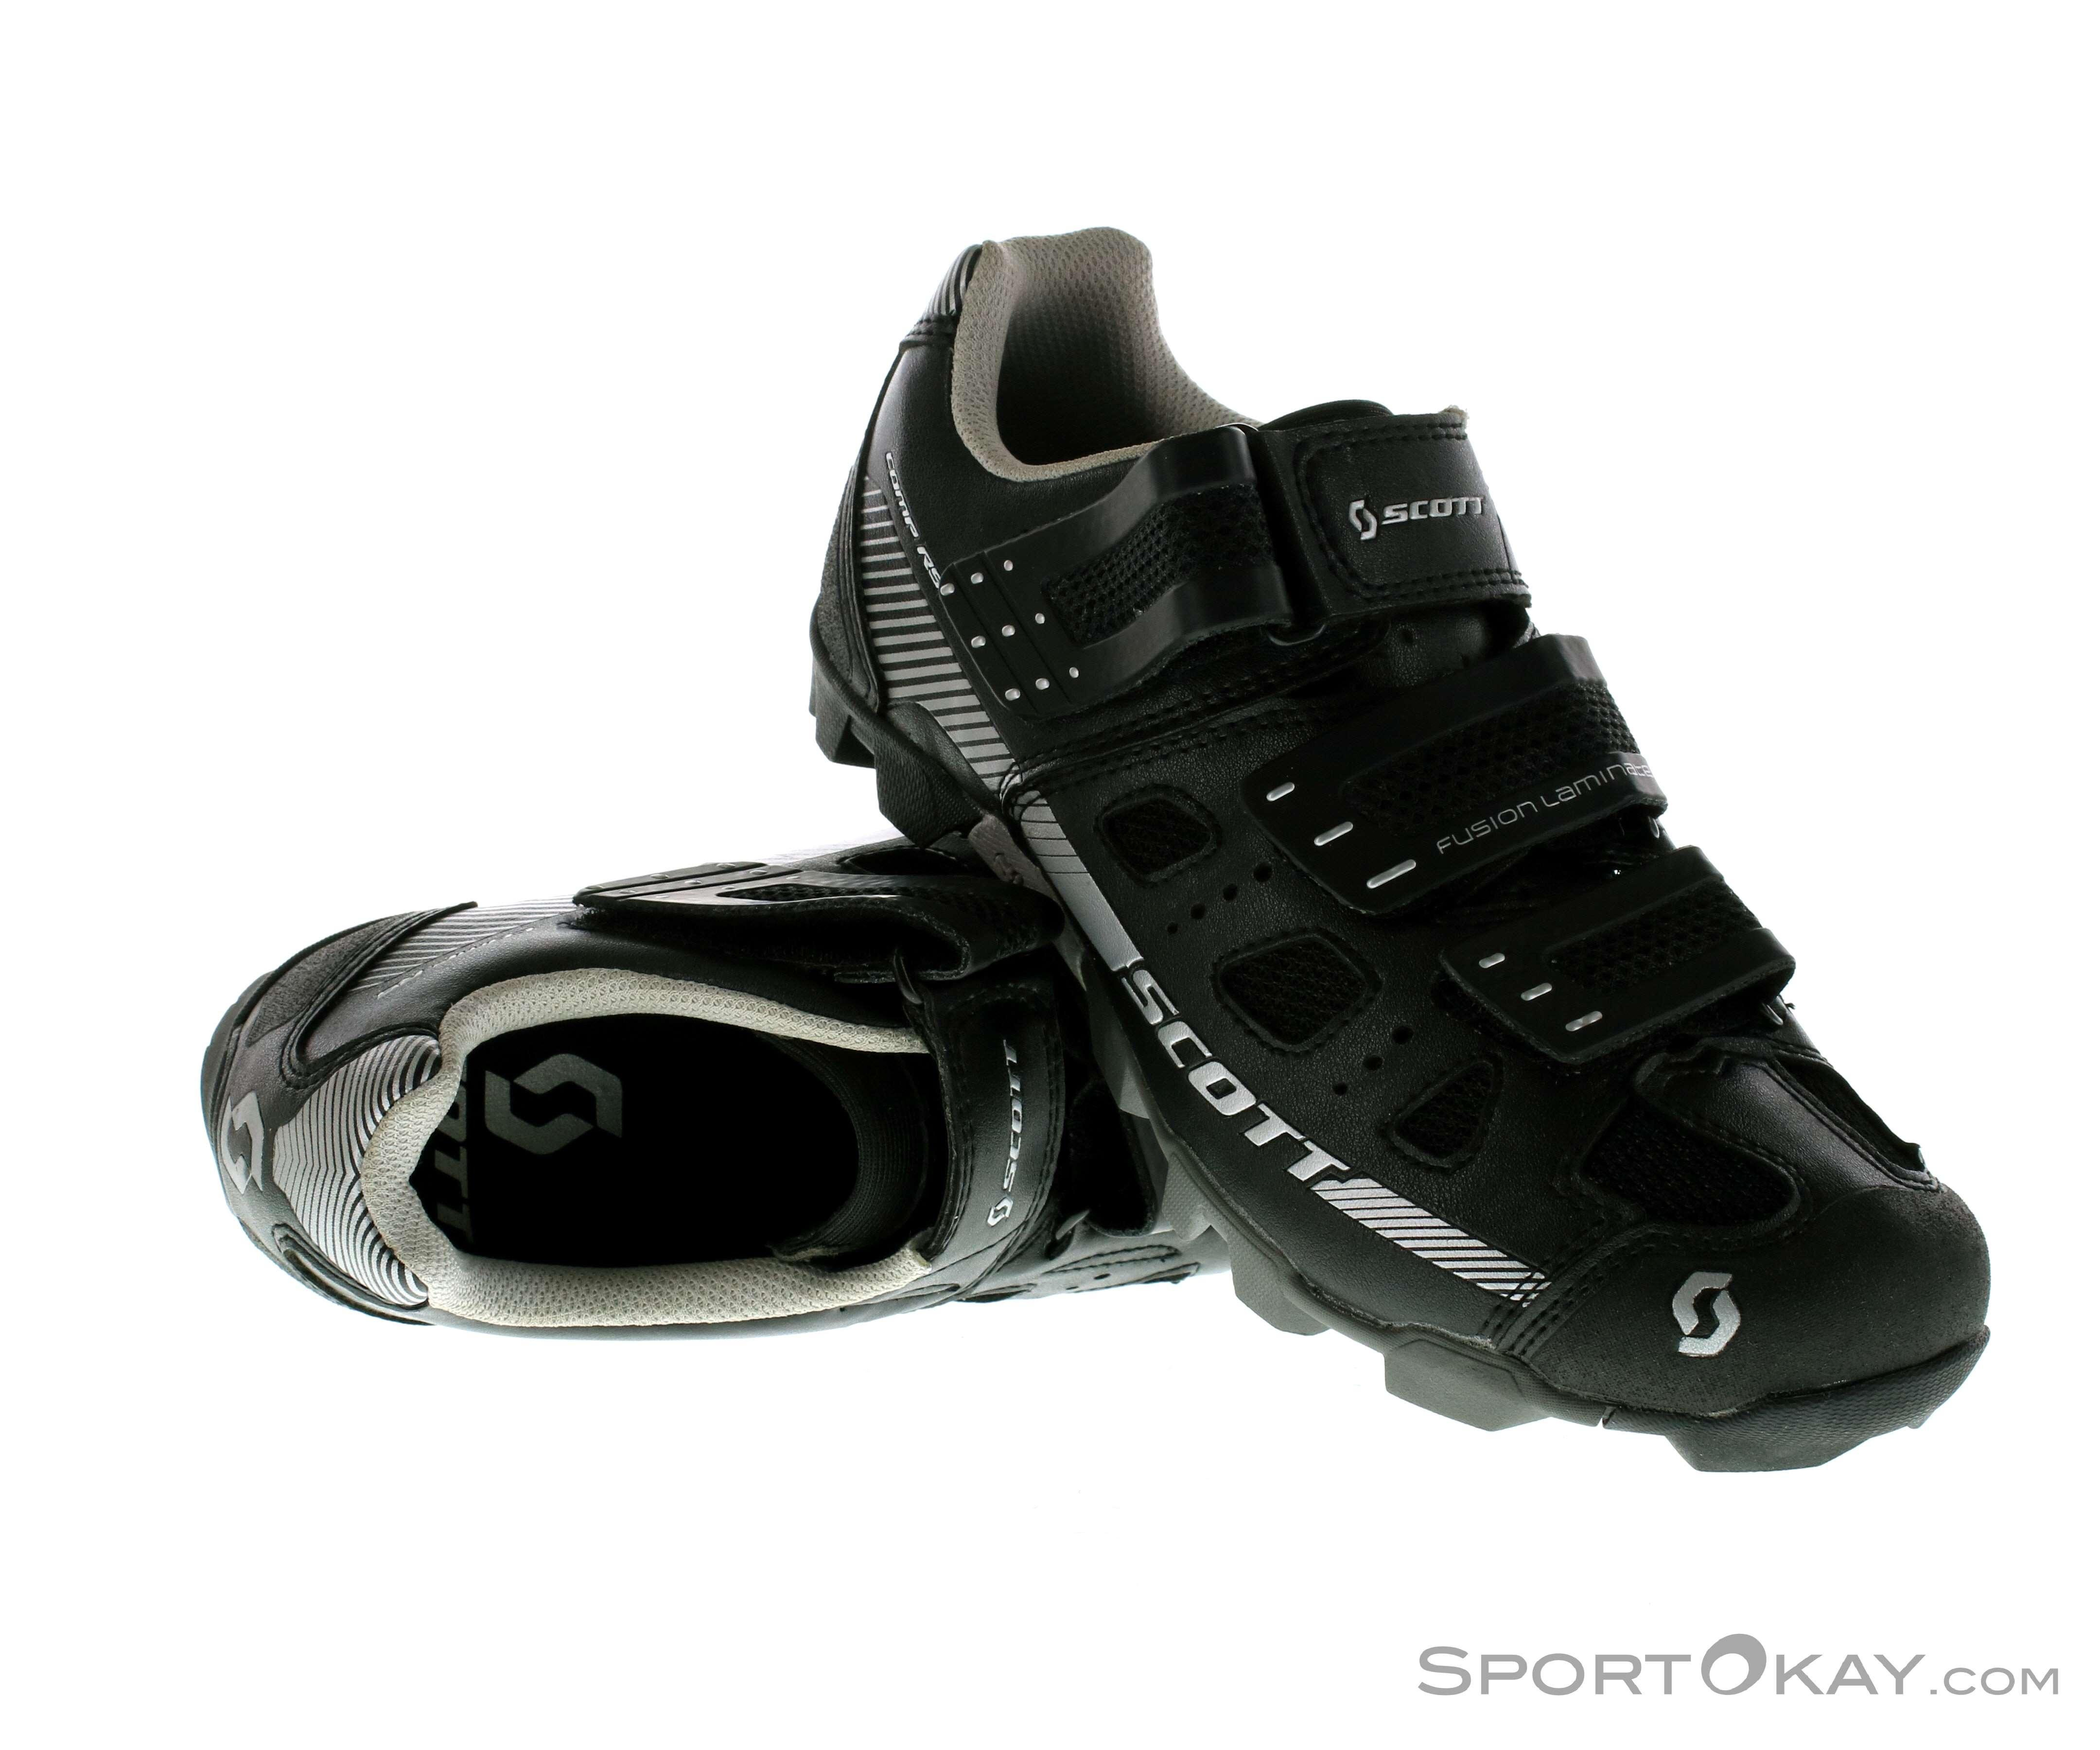 Scott MTB Comp RS Lady Shoe Damen Bikeschuhe, Scott, Schwarz, , Damen, 0023-10302, 5637488947, 7613317433541, N1-01.jpg